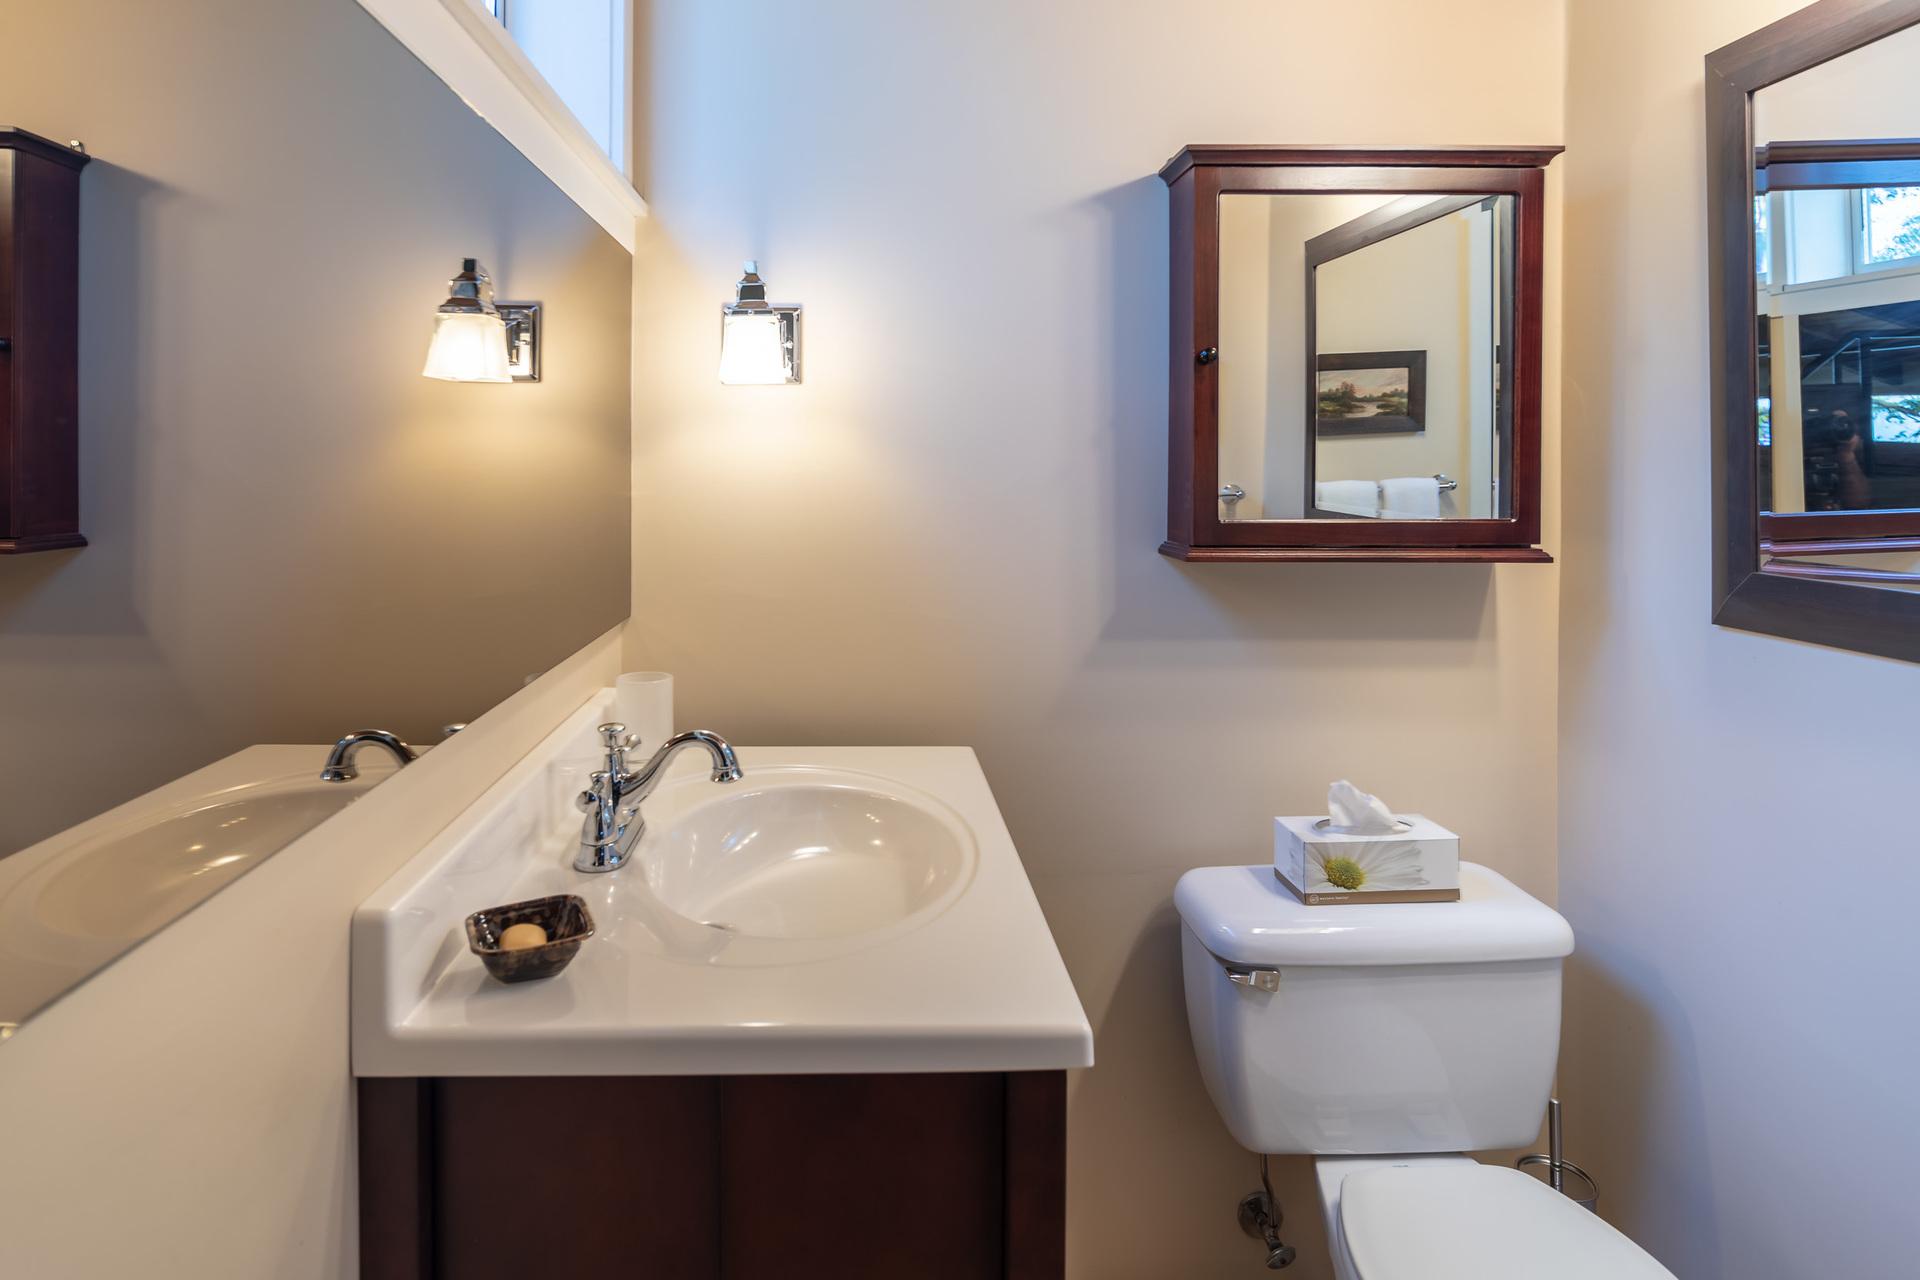 Main House Guest Bathroom at 4855 Major Road, Cordova Bay, Saanich East